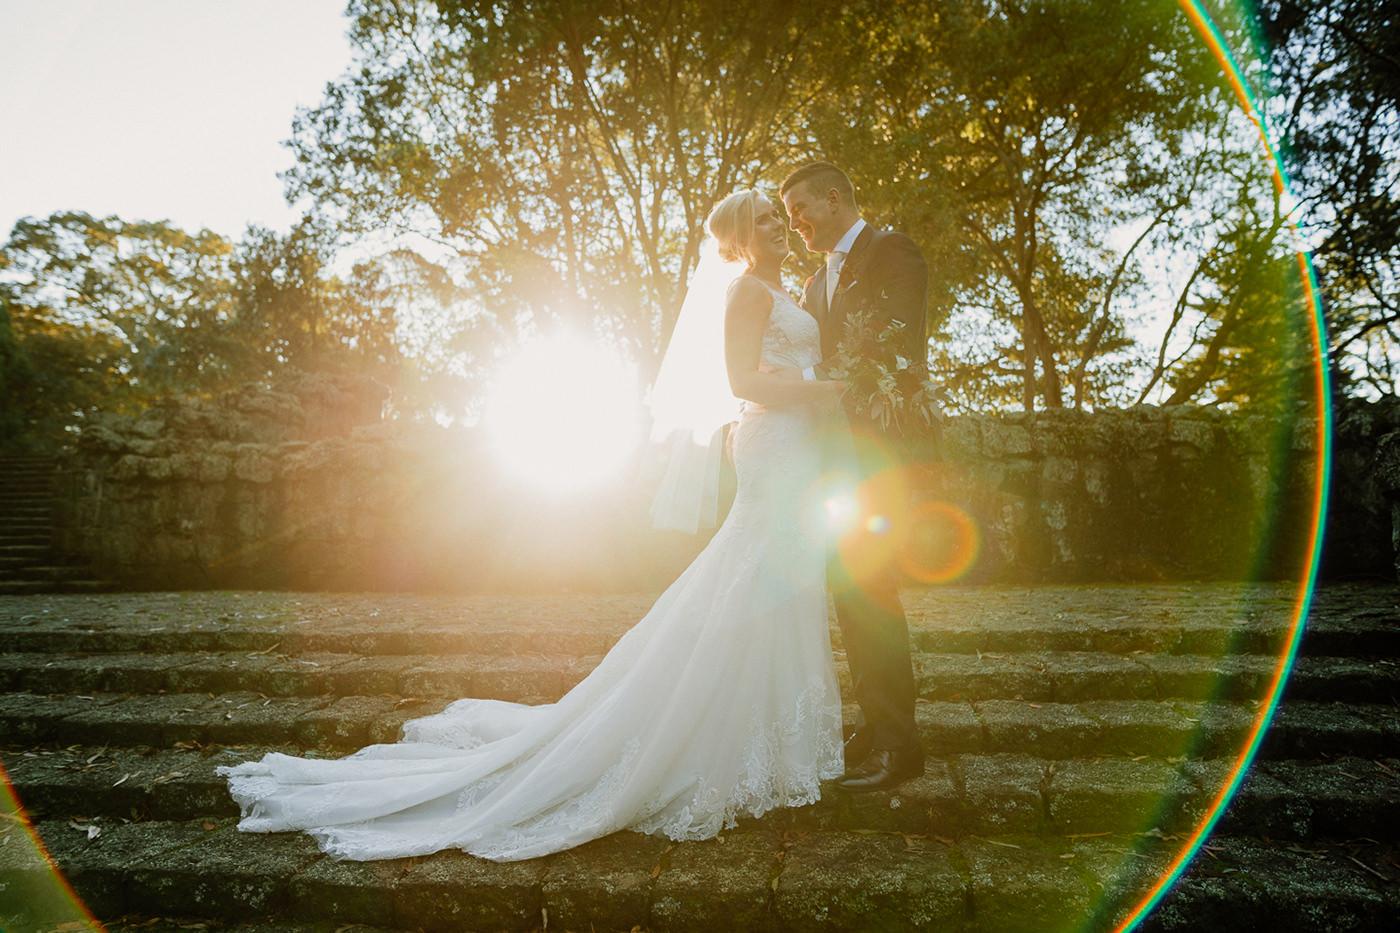 wedding_photographer_nz-00062.jpg